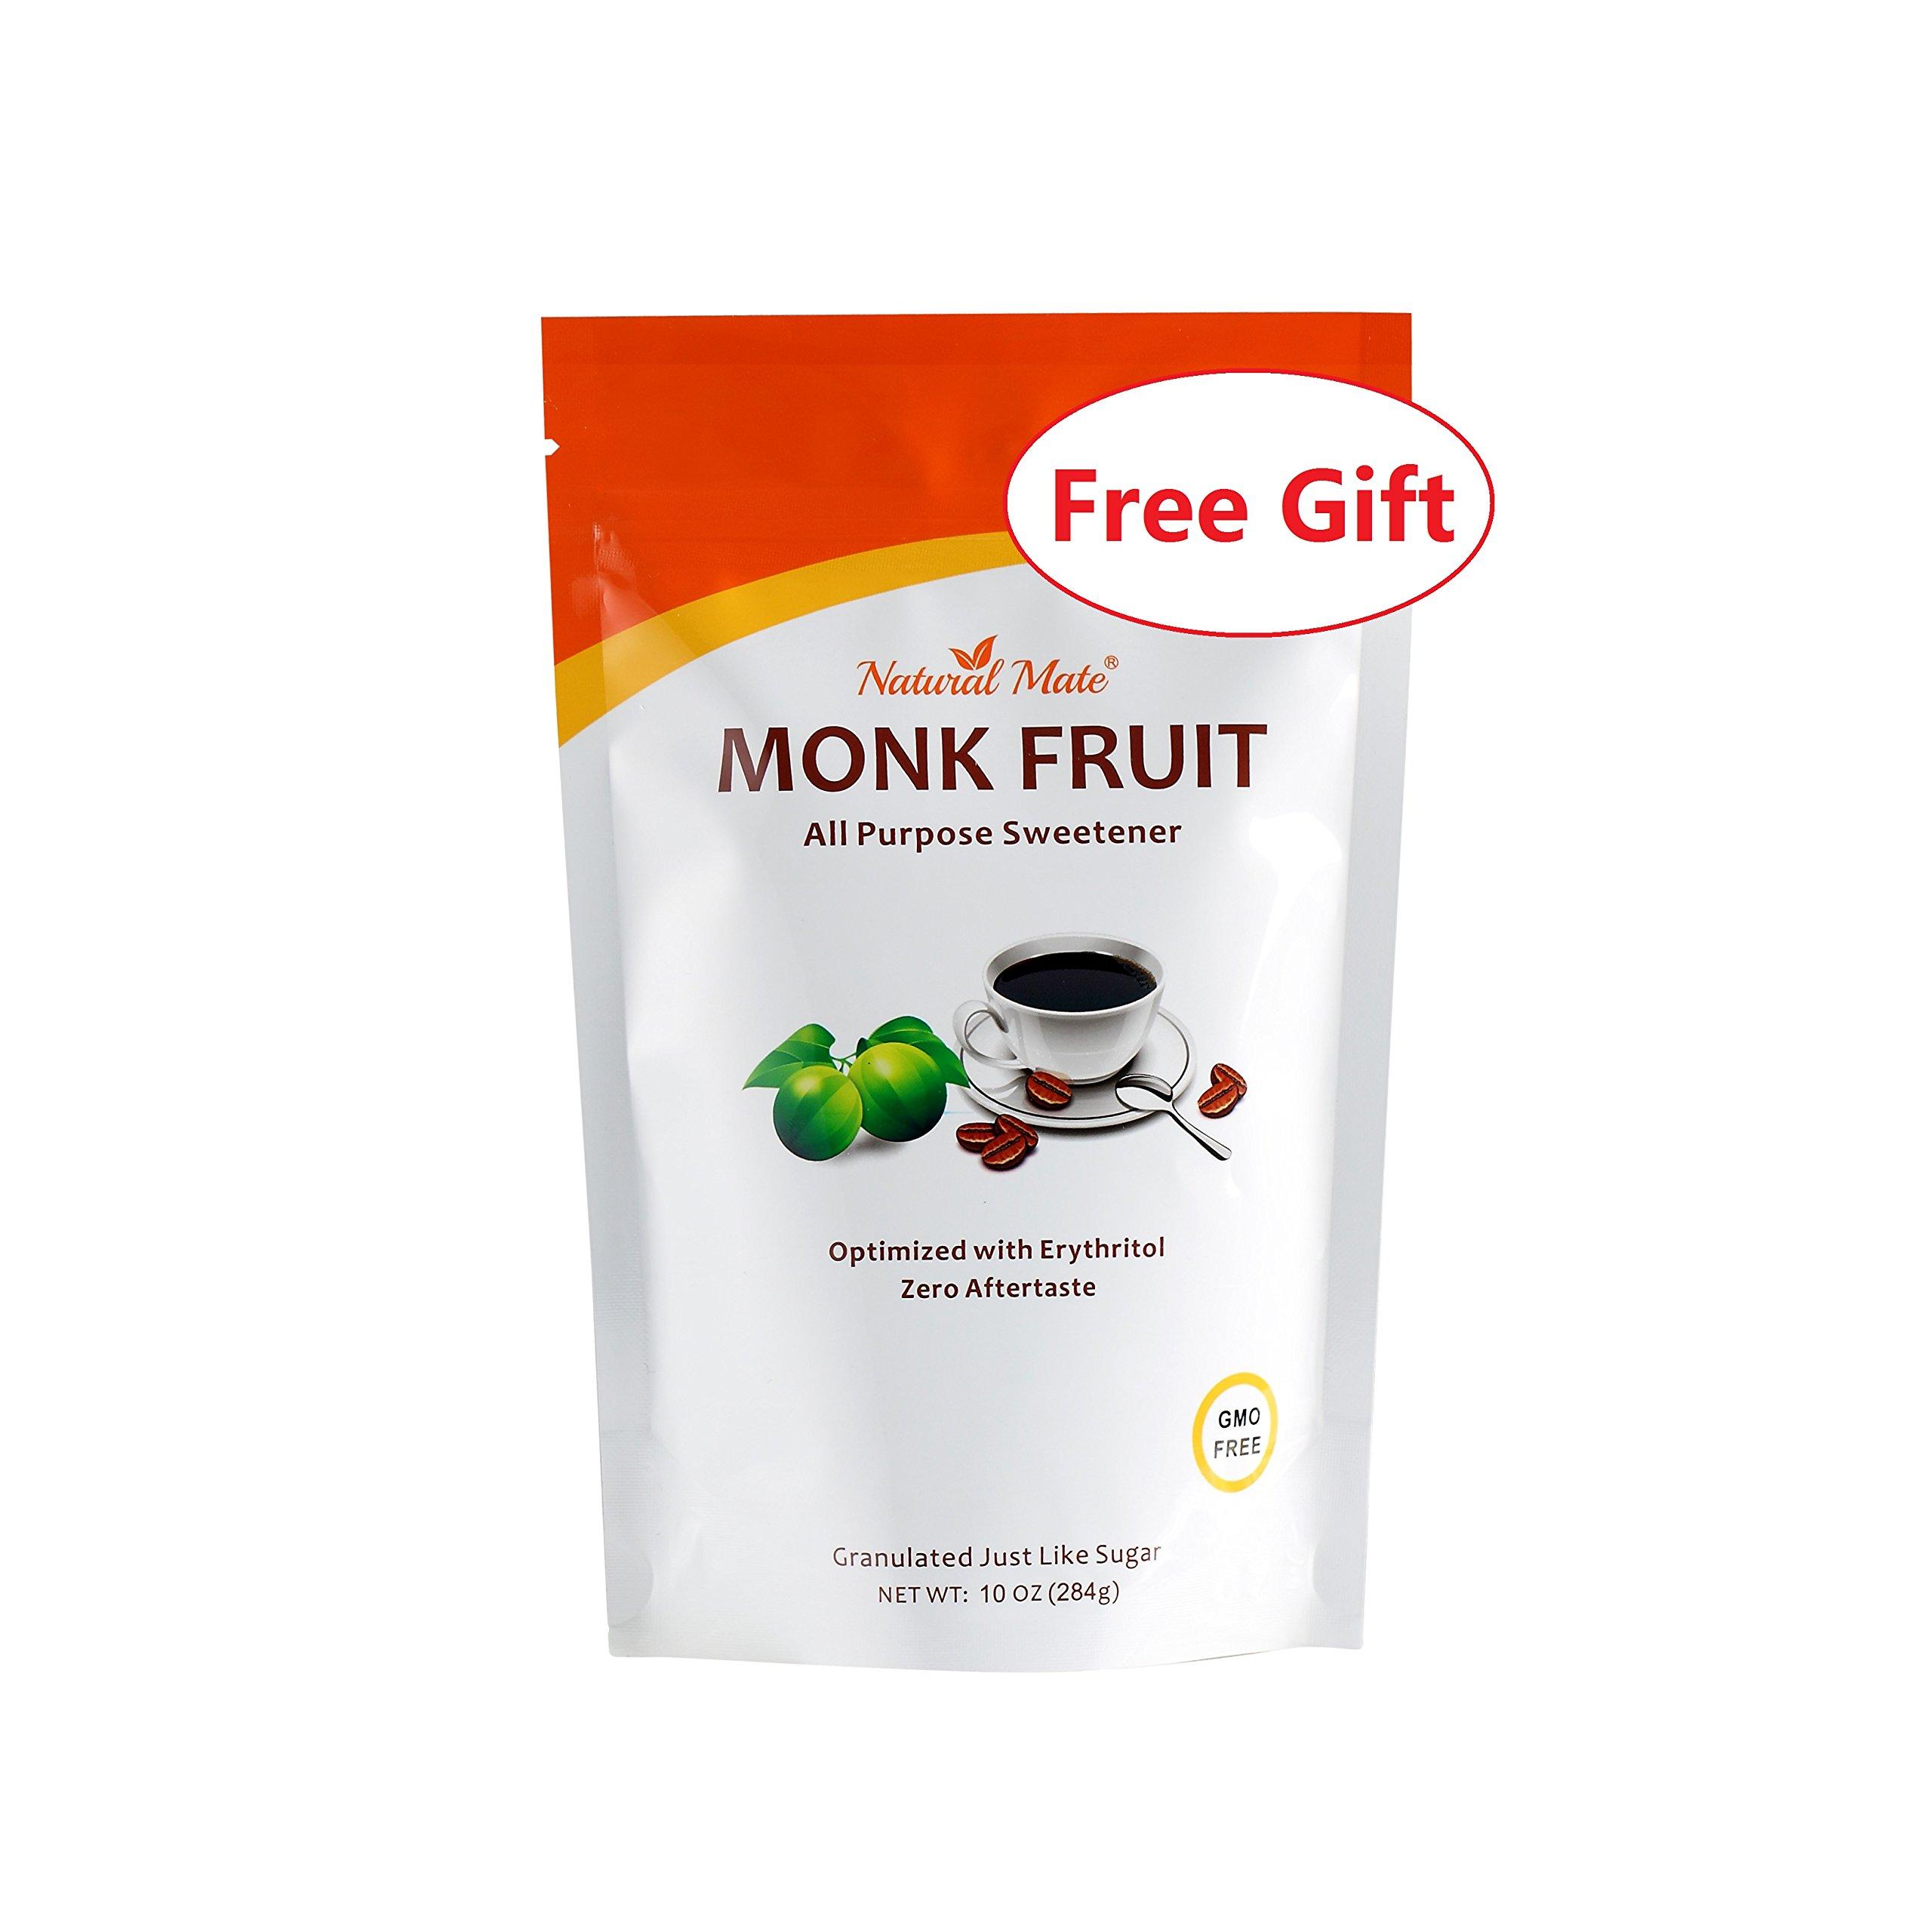 Natural Mate Stevia All Purpose Natural Sweetener, 5kgs/11Lbs   Free Gift: Monk Fruit Sweetener (10oz) by Natural Mate (Image #3)